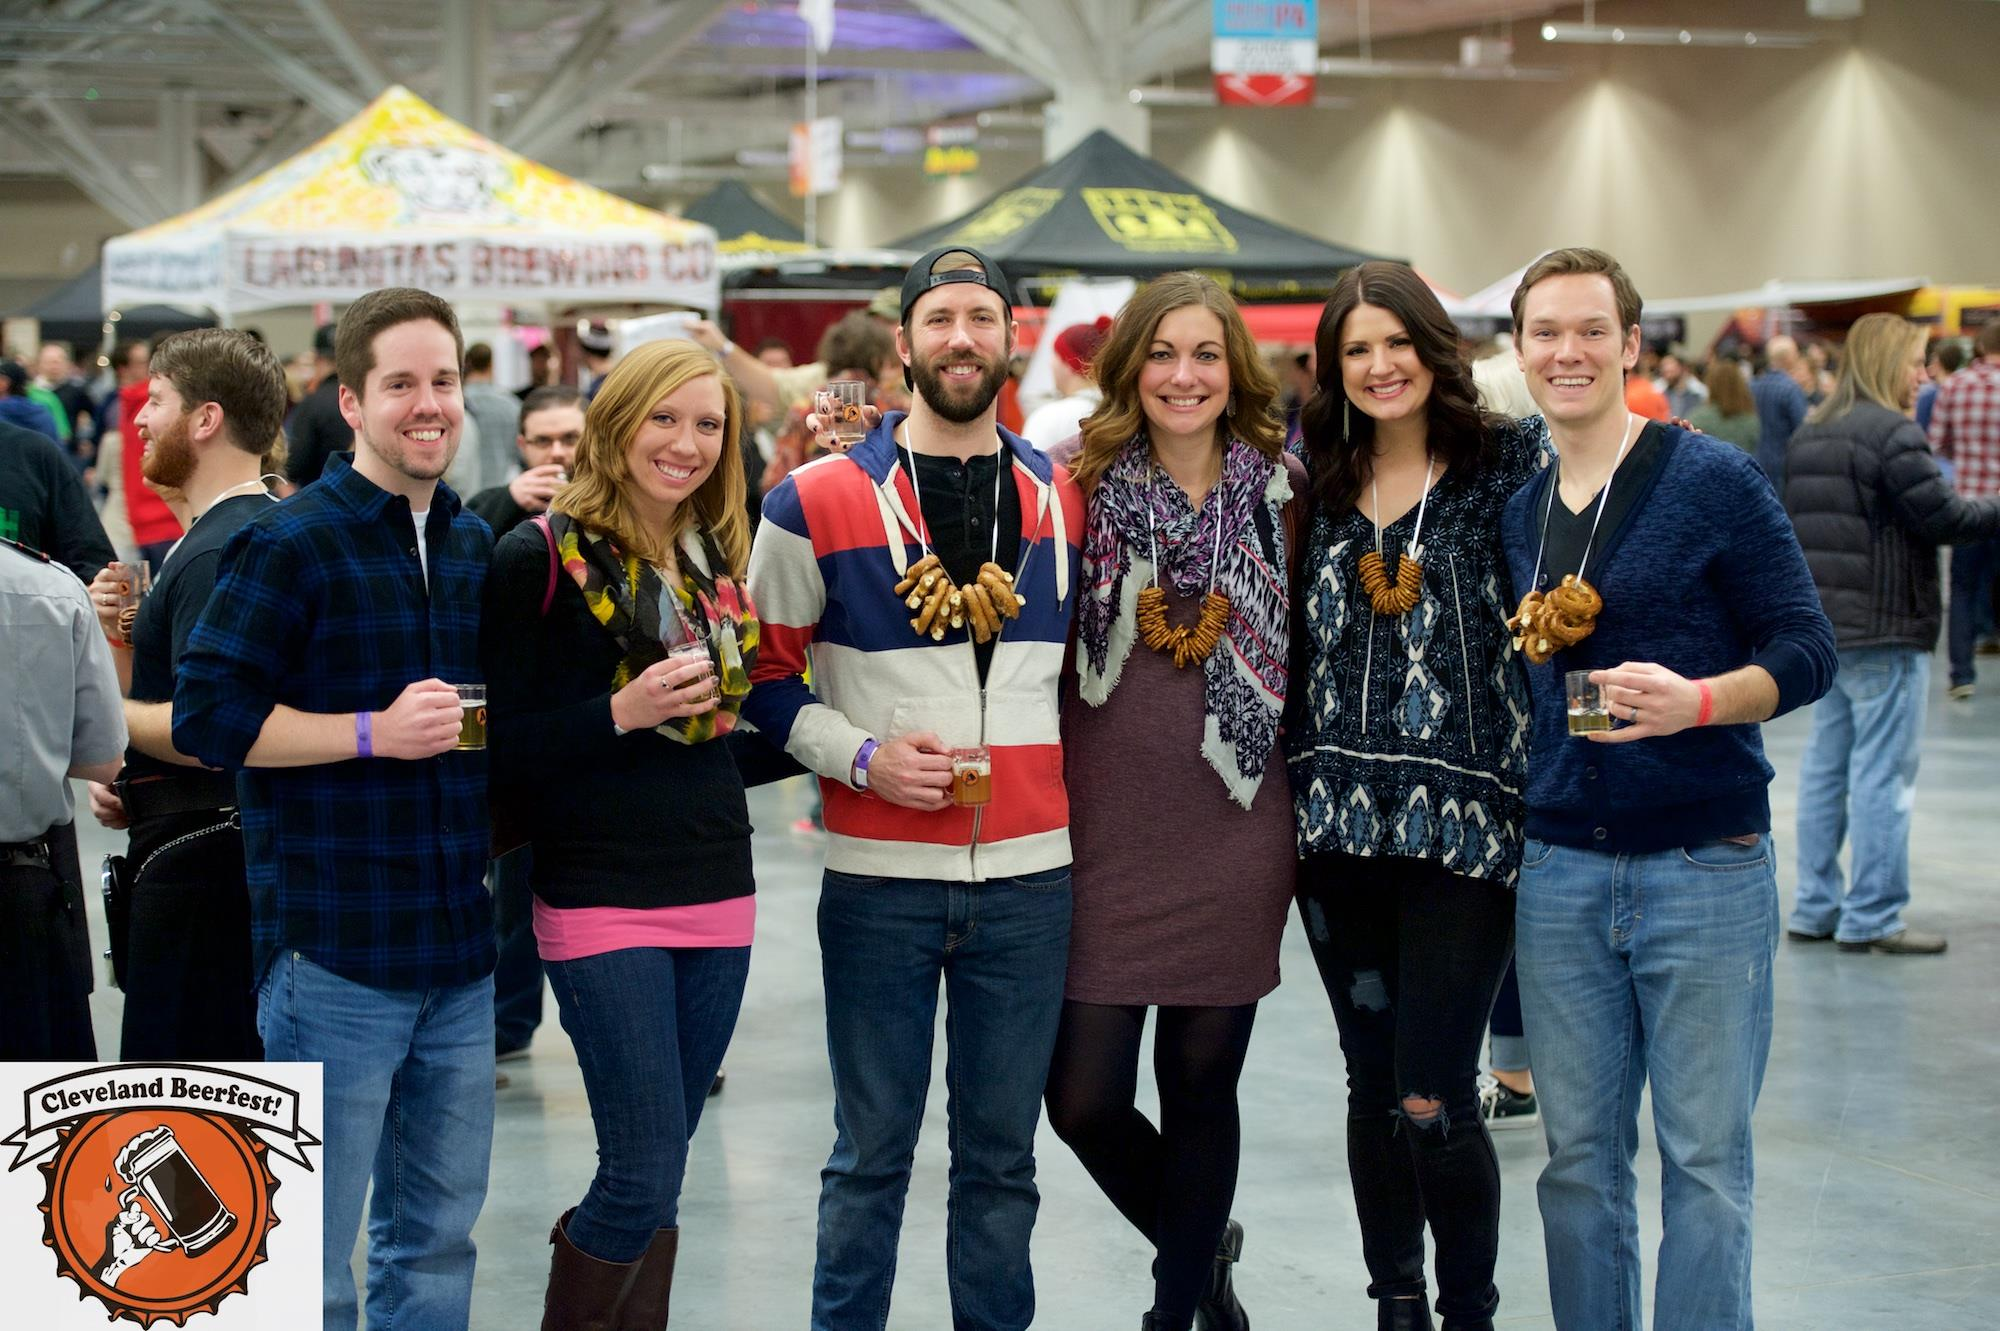 Beerfest #6